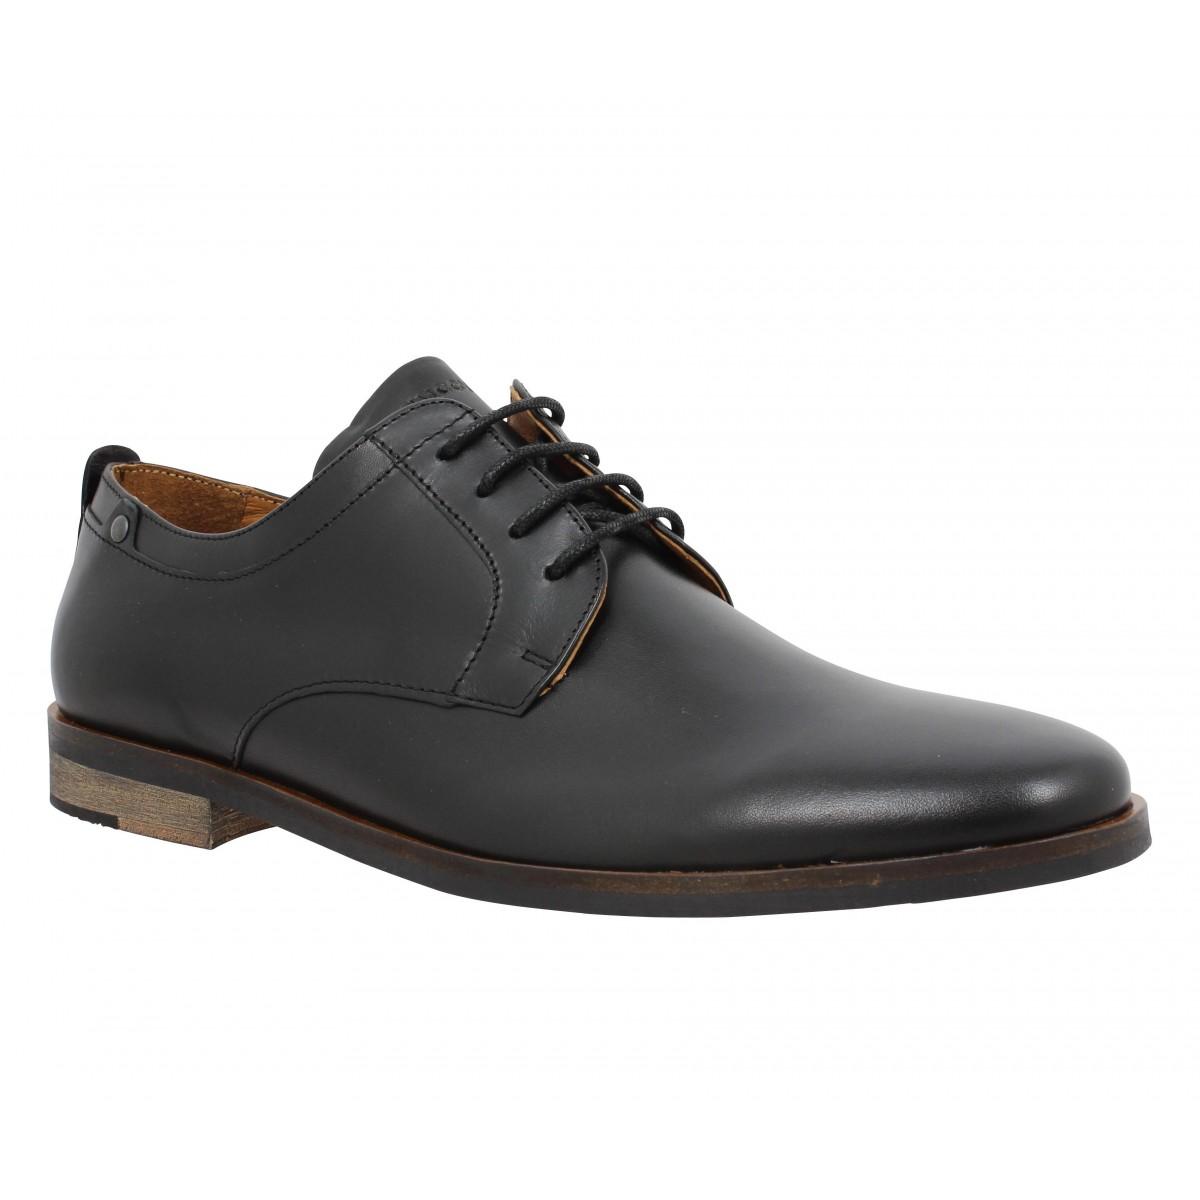 Chaussures à lacets SCHMOOVE Dirtydandy Station cuir Homme Noir